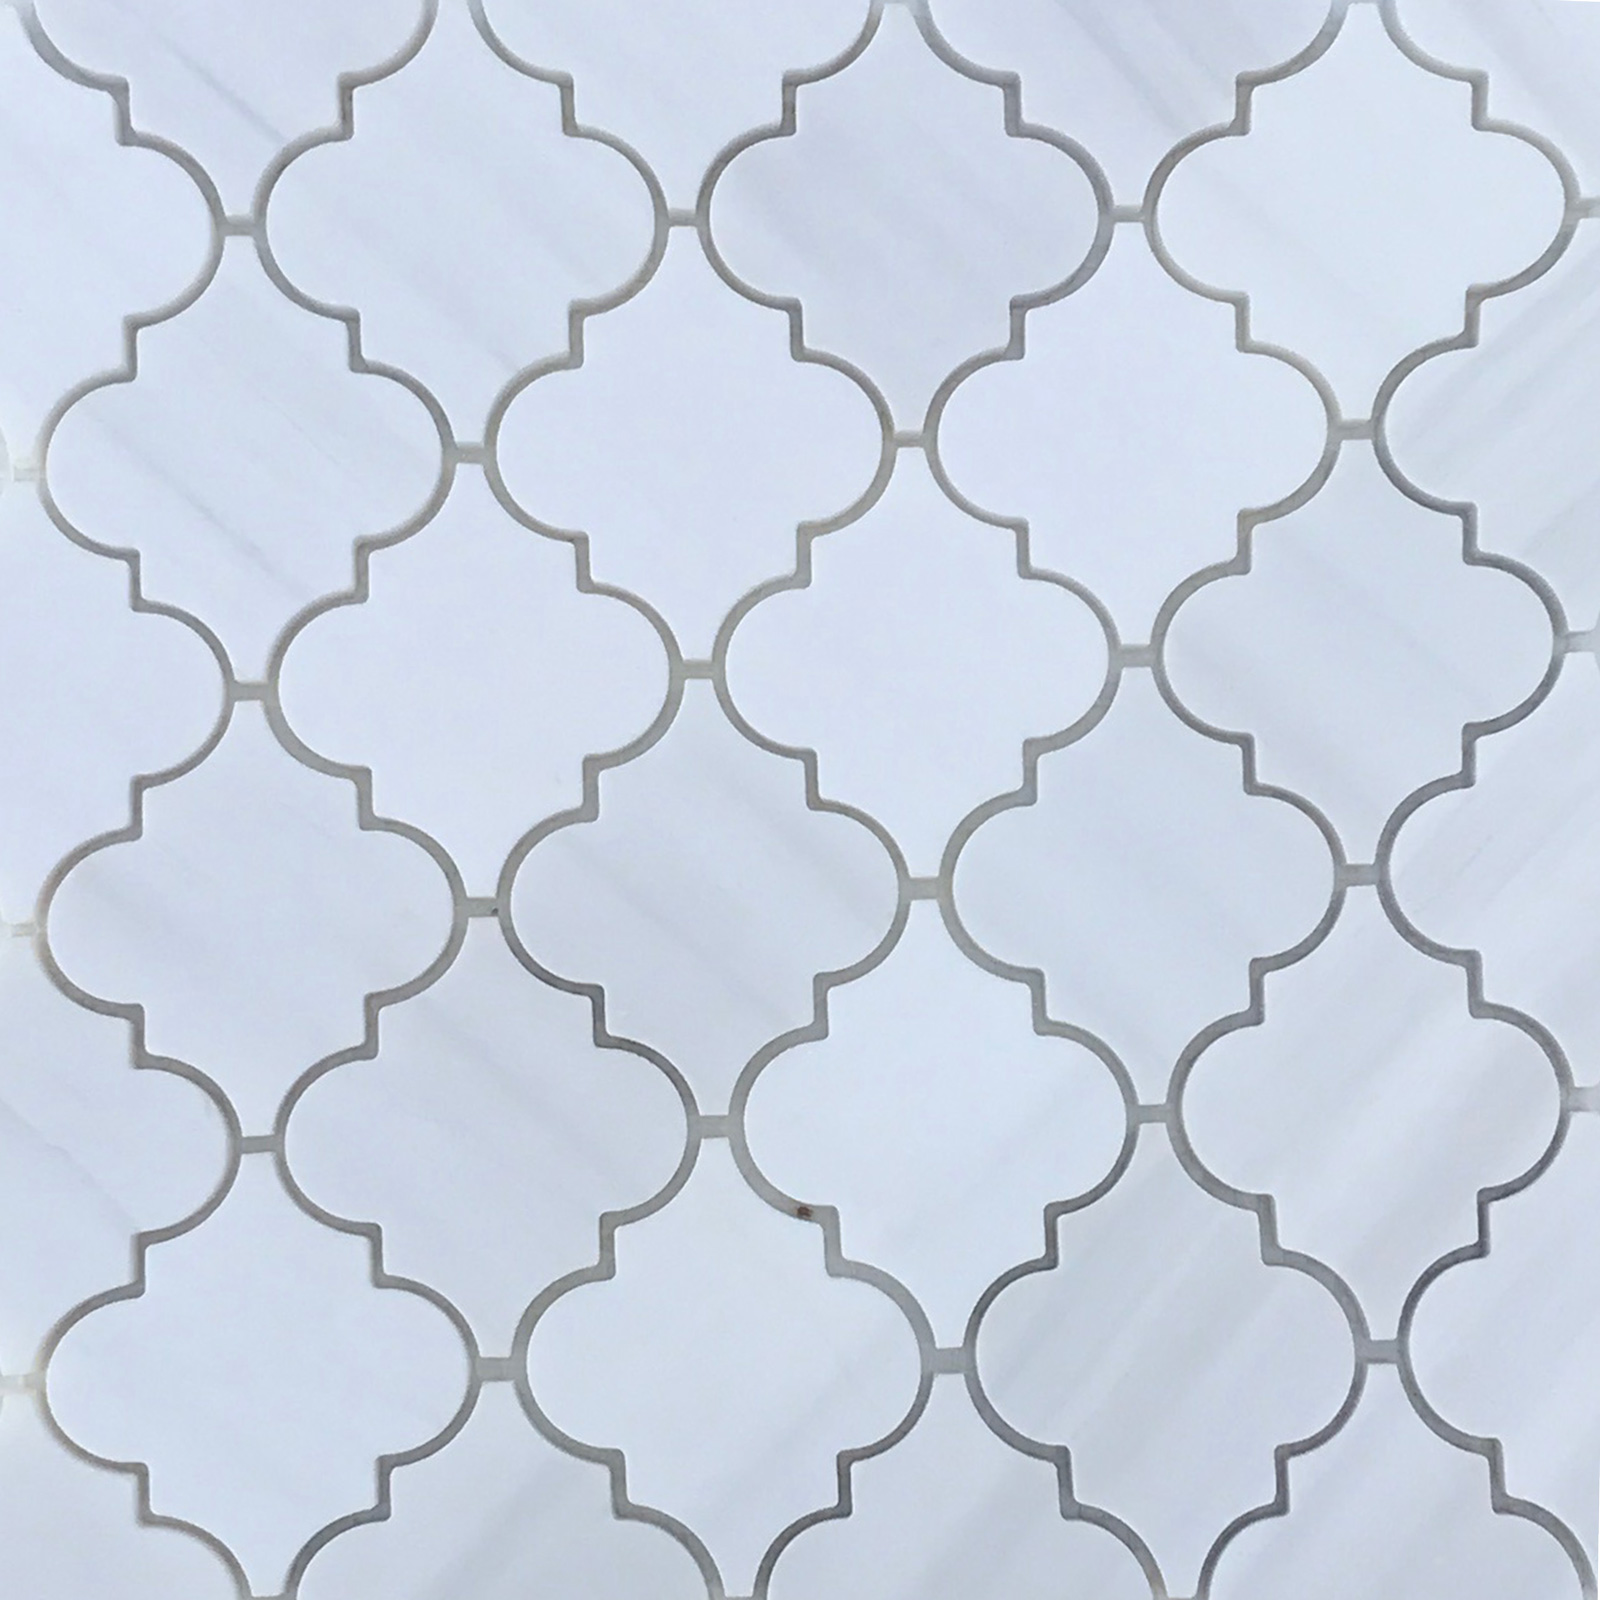 Luxury Dolomite Arabesque Lantern Tile